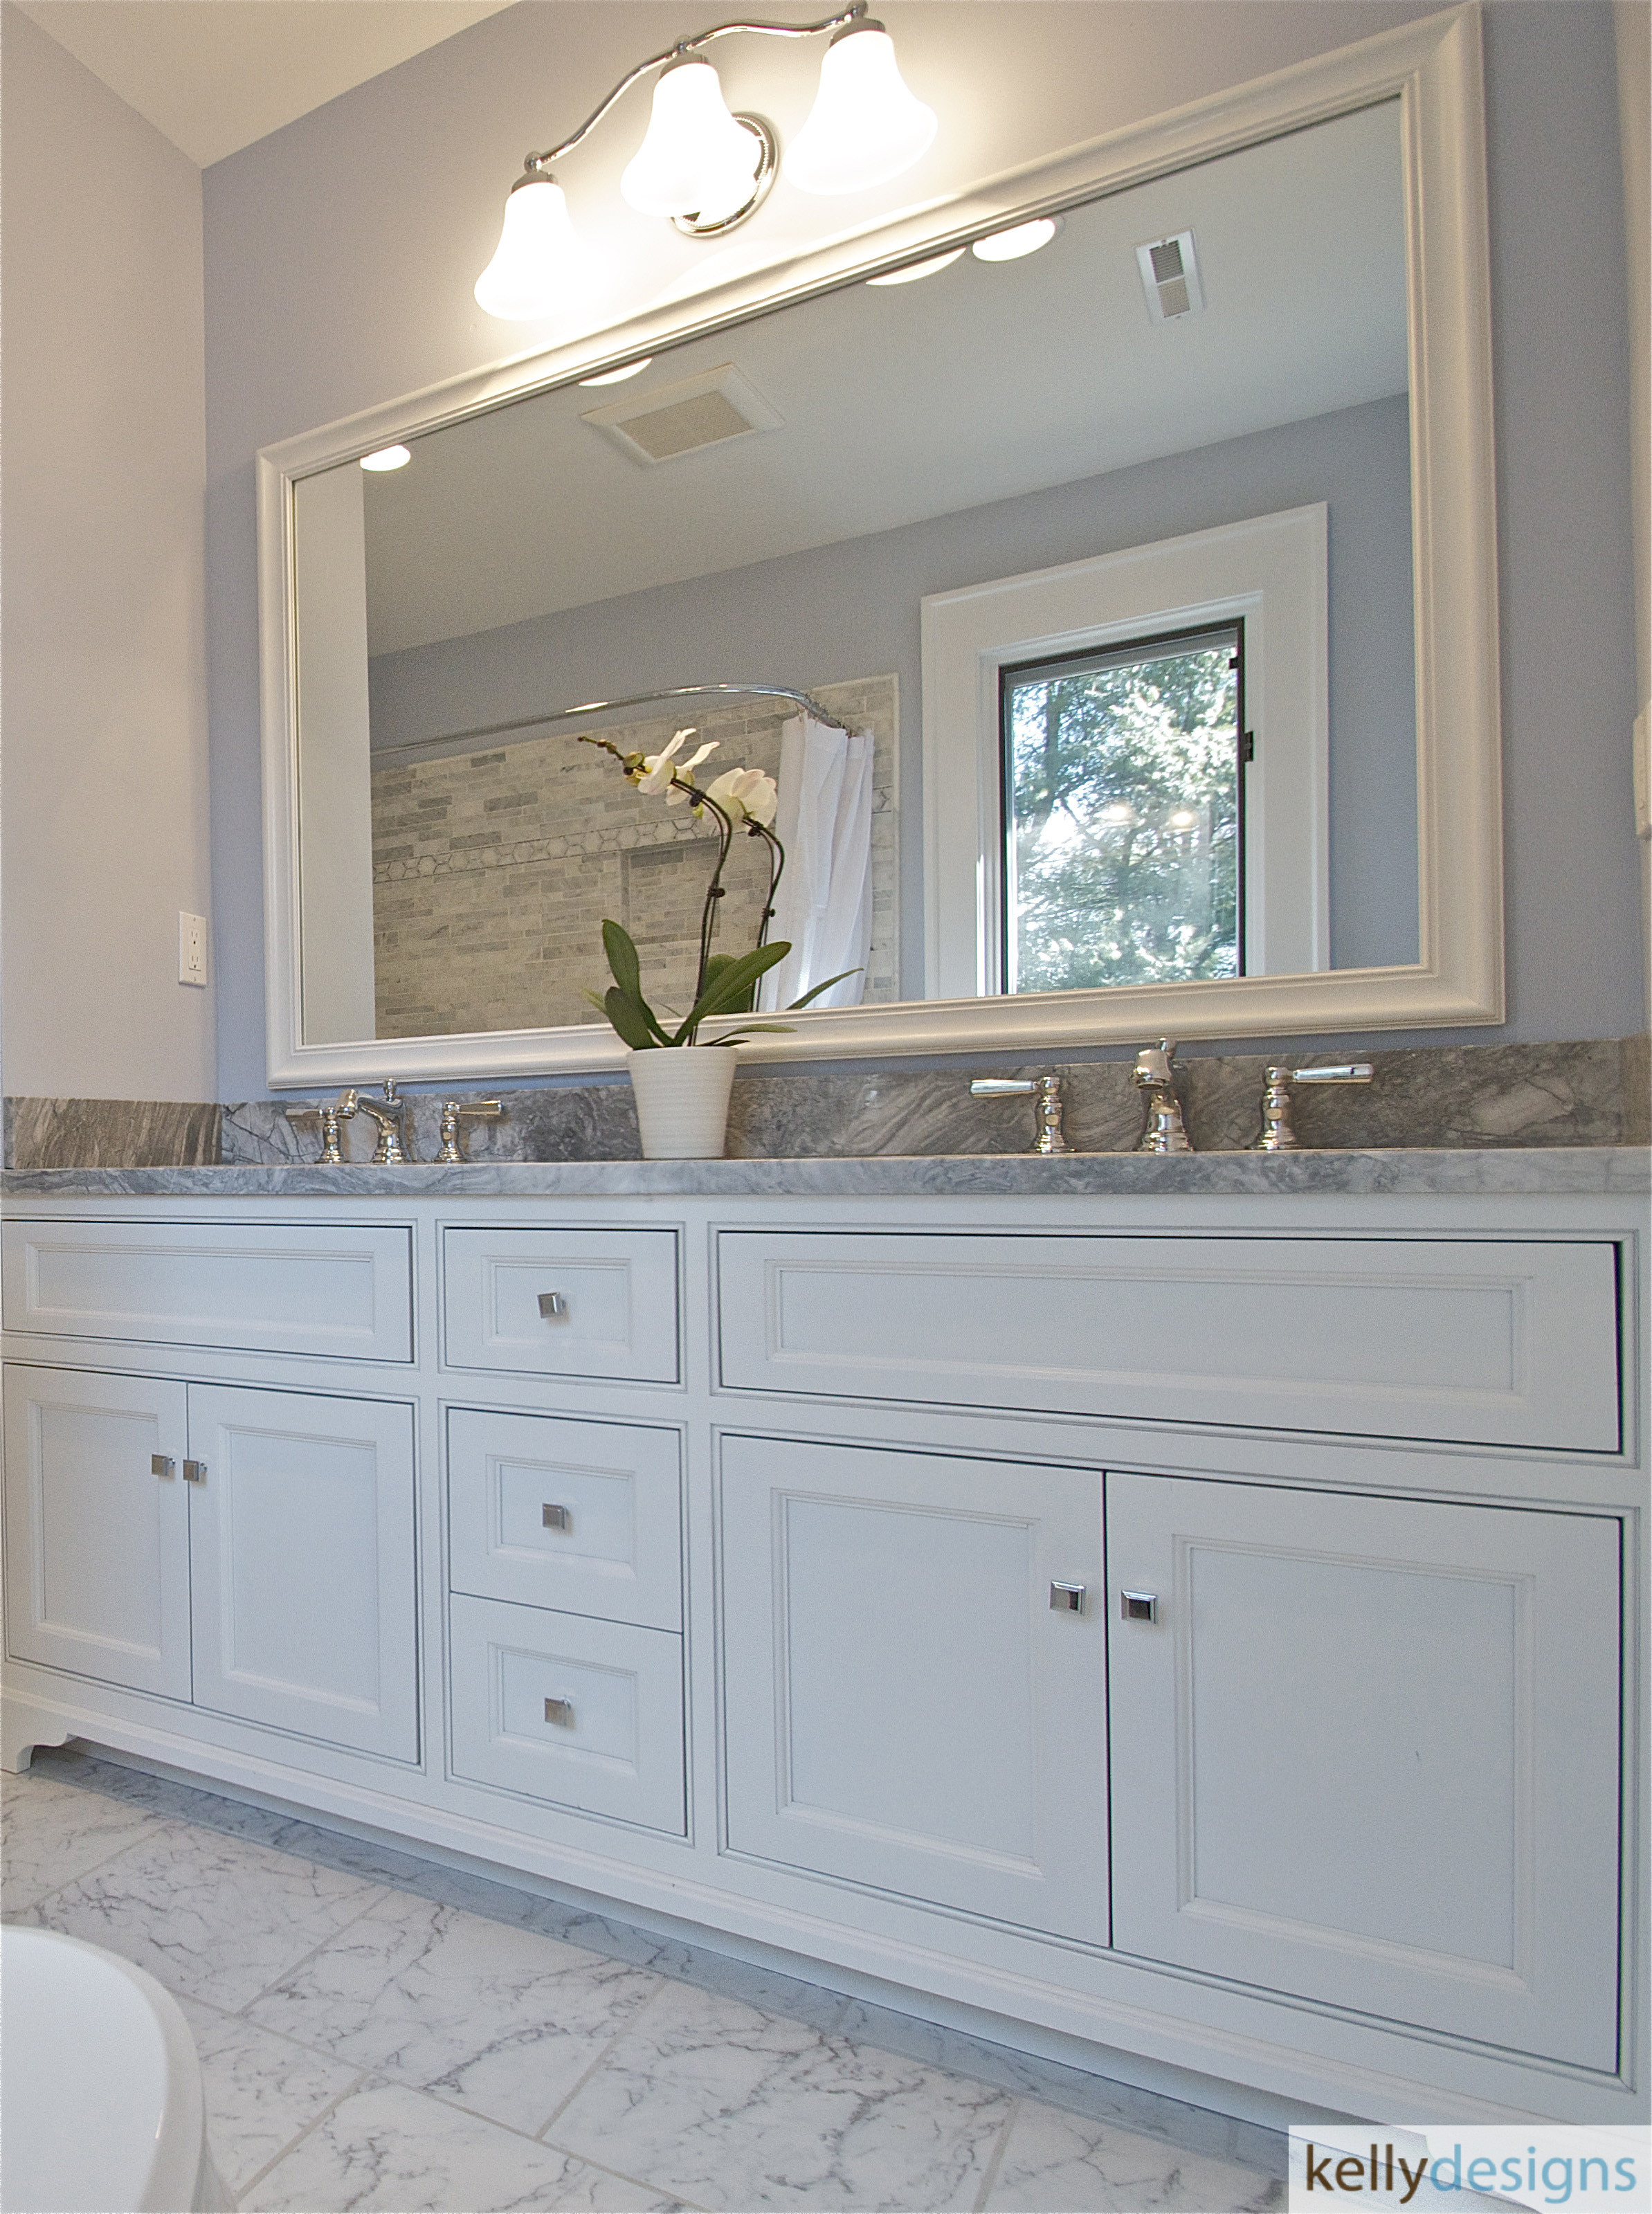 Redding Bath Remodel - Bathroom 4 - Interior Design by kellydesigns